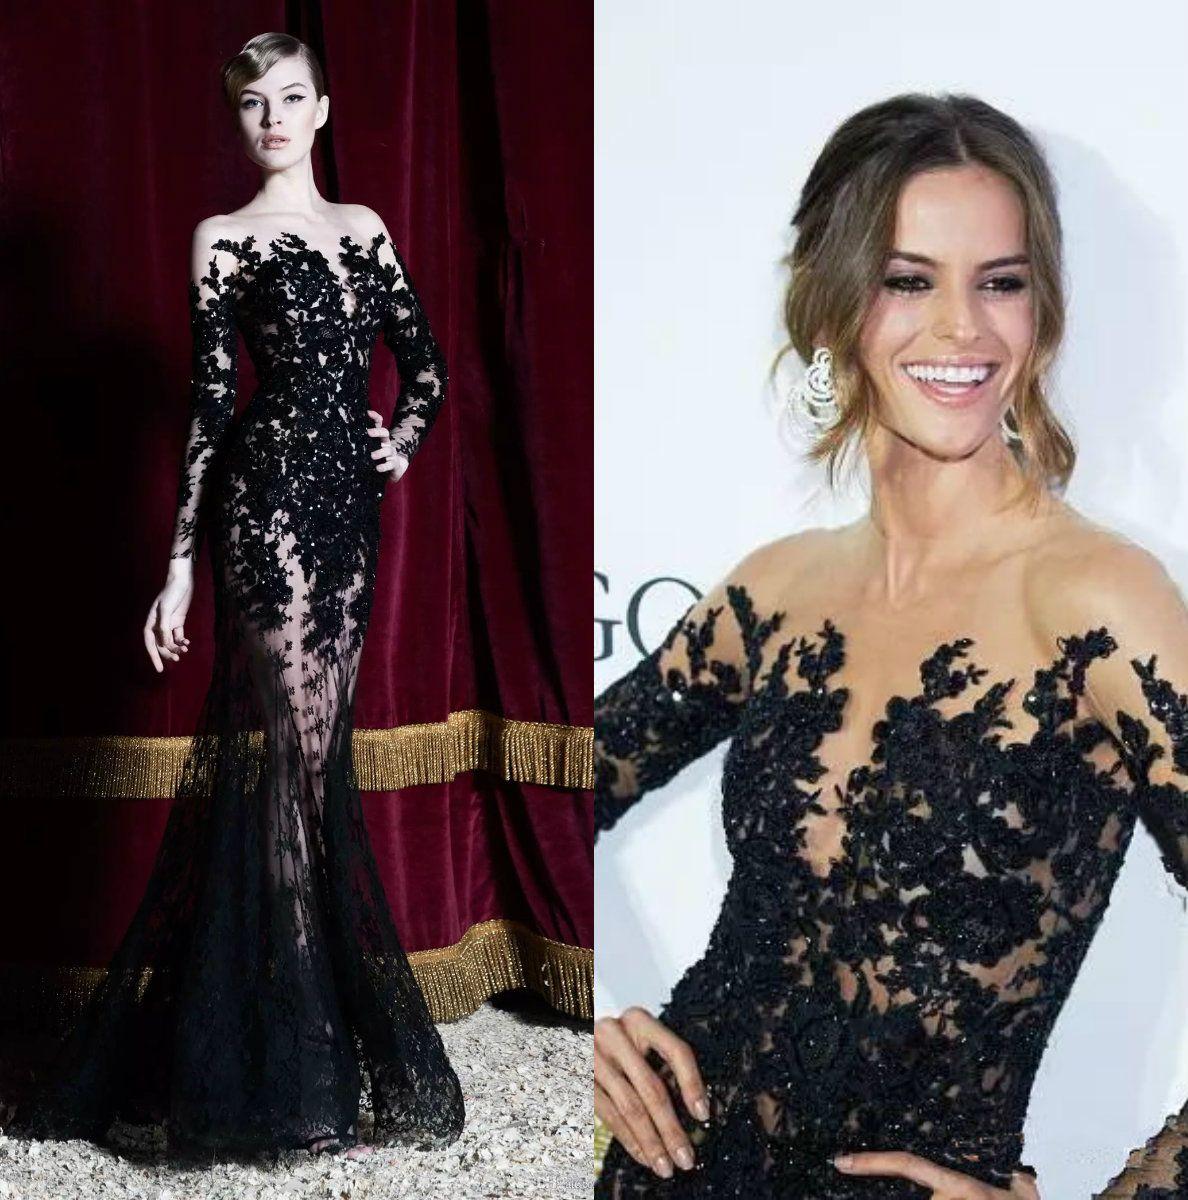 eccf557e1f8 Zuhair Murad Evening Dresses Long Sleeves Black Lace Sheer Mermaid Prom  Dresses Party Gowns Long Special Occasion Dubai Arabic Dresses Dress Shop  Formal ...